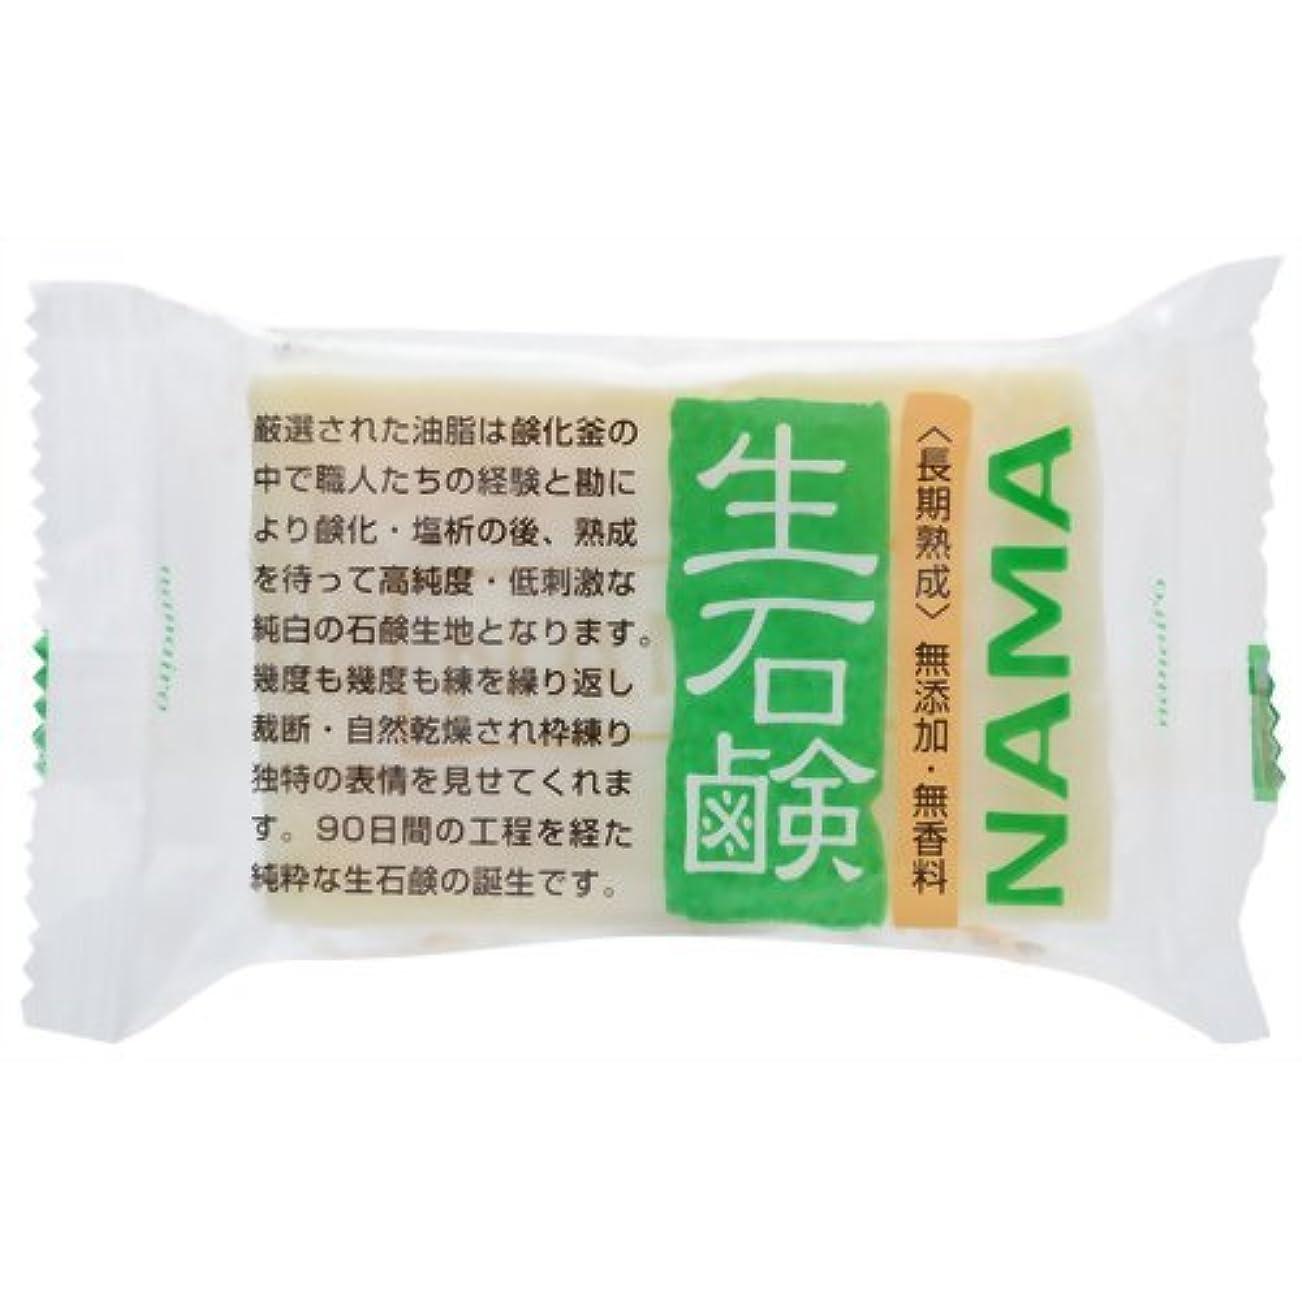 生石鹸NAMA 100g